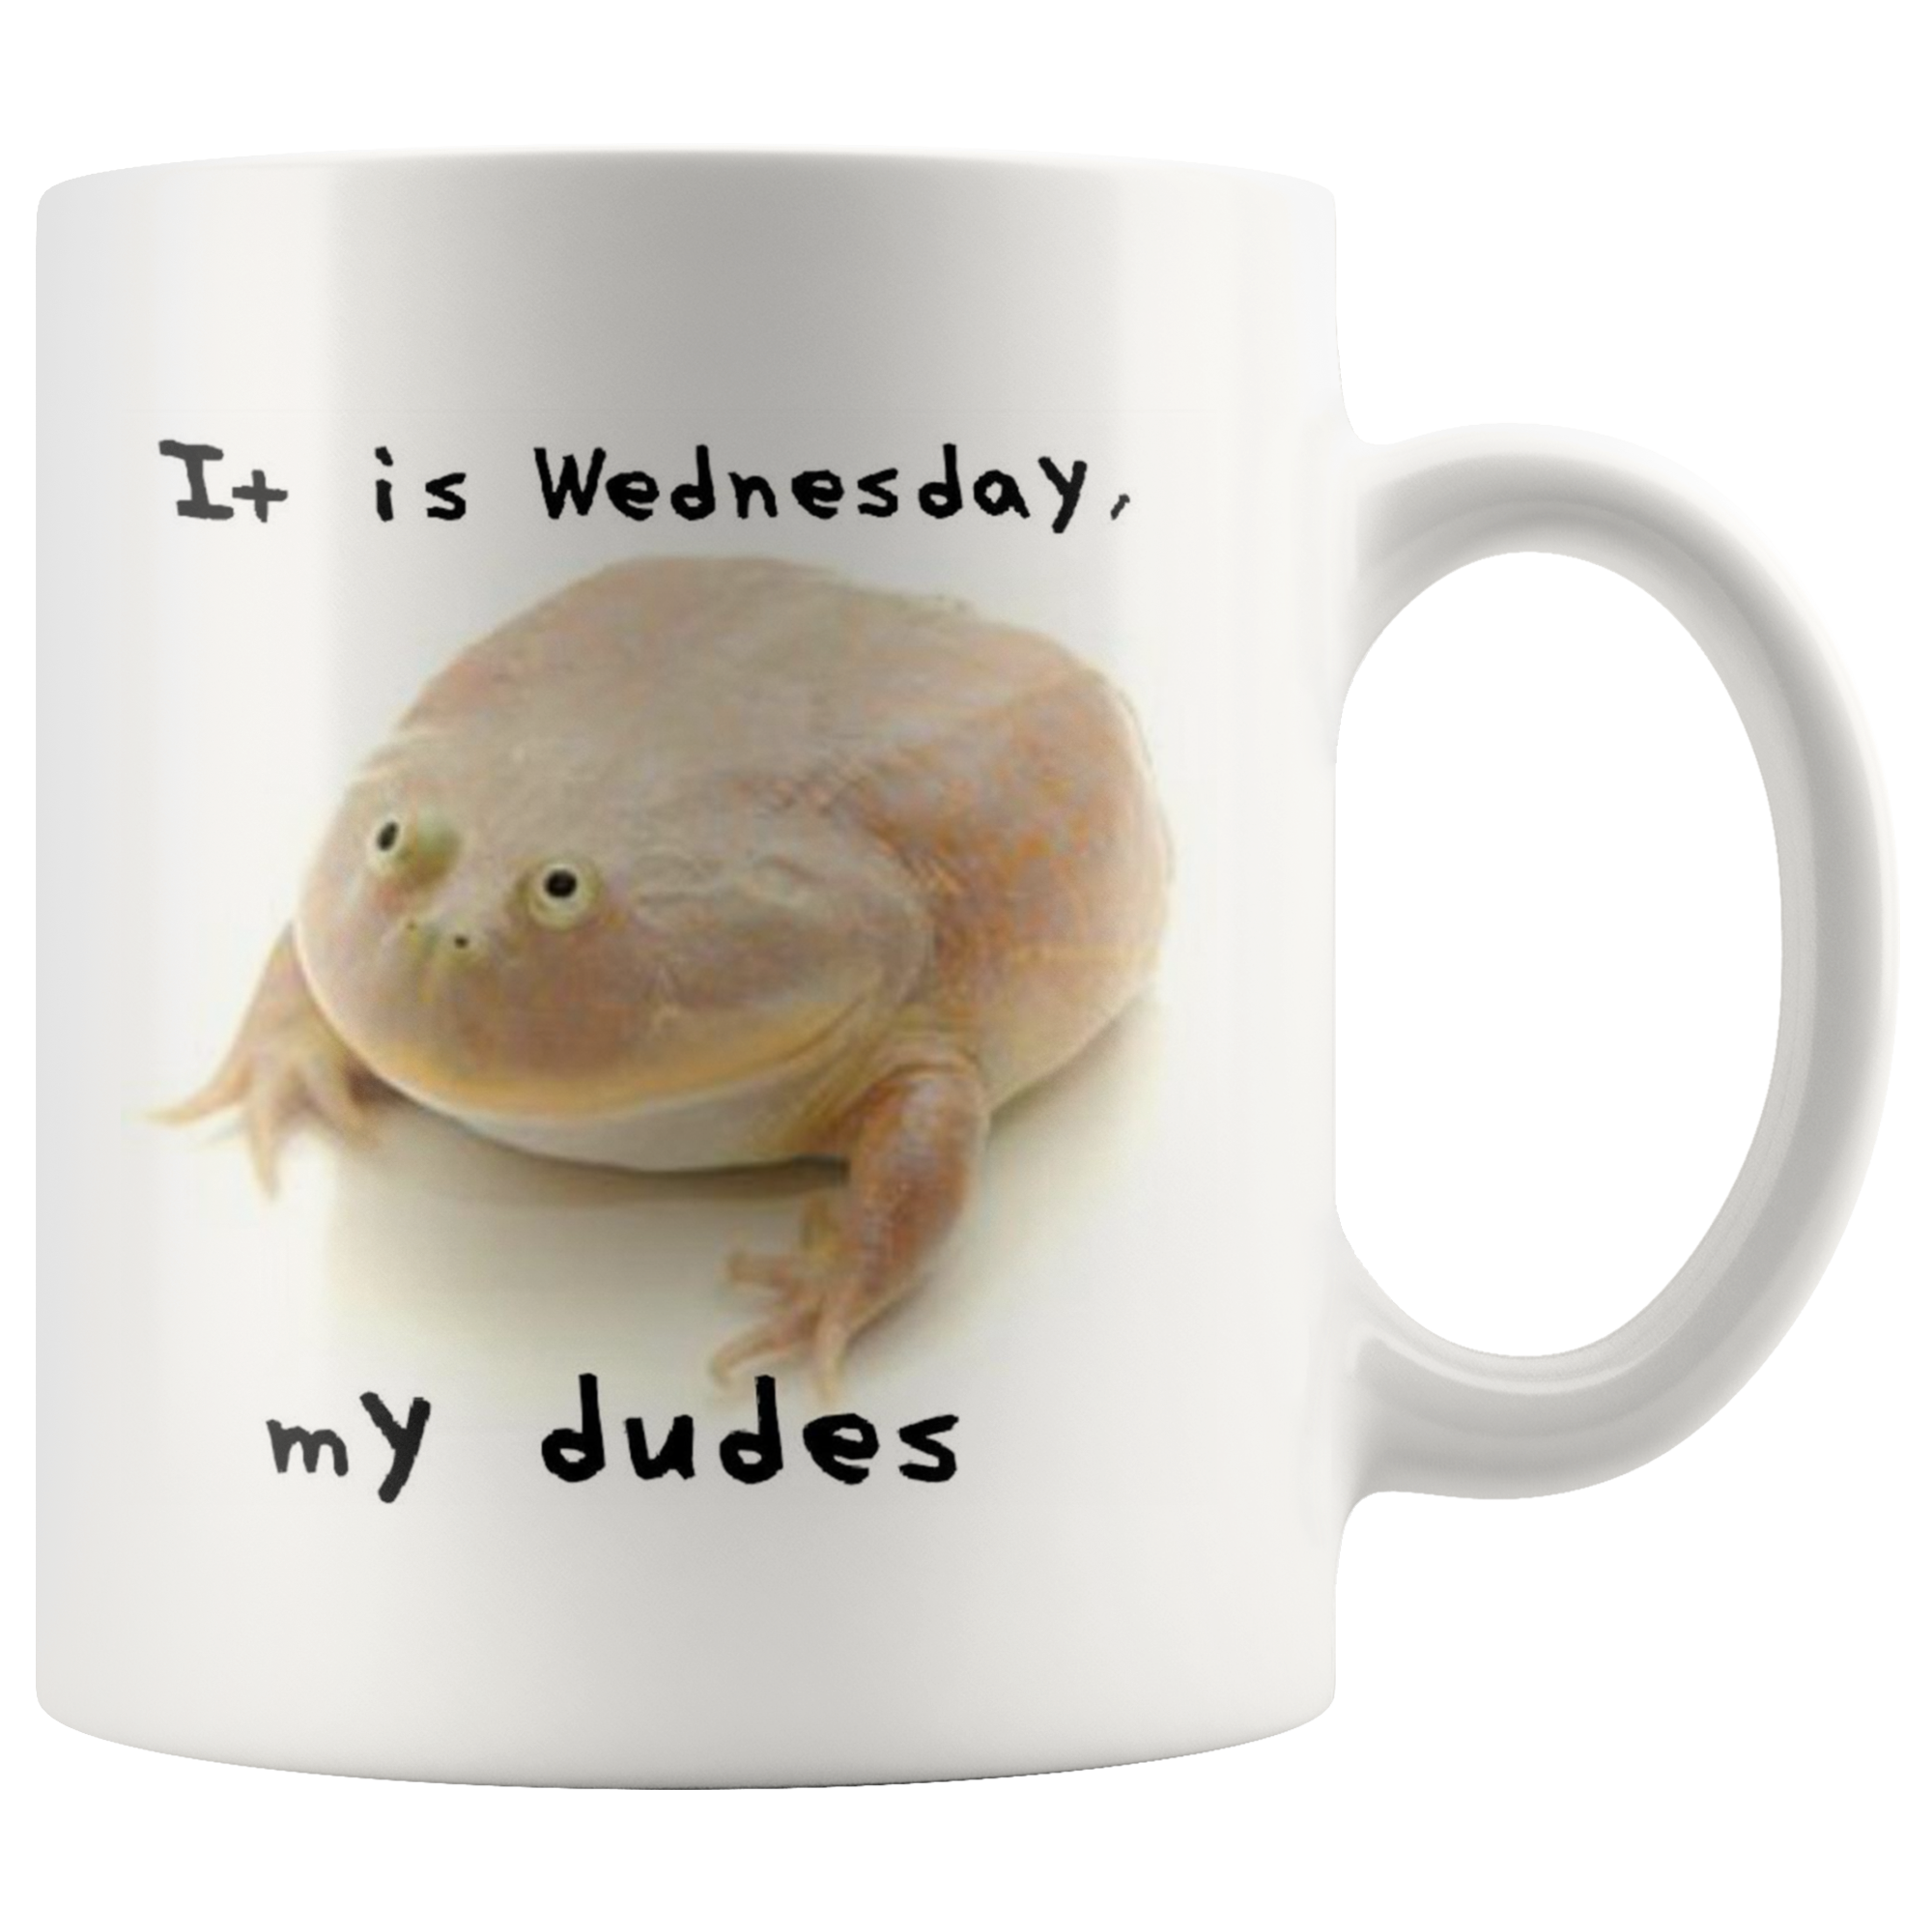 Wednesday Frog Meme Coffee Mug Mugs Funny Meme Gifts Coffee Mugs